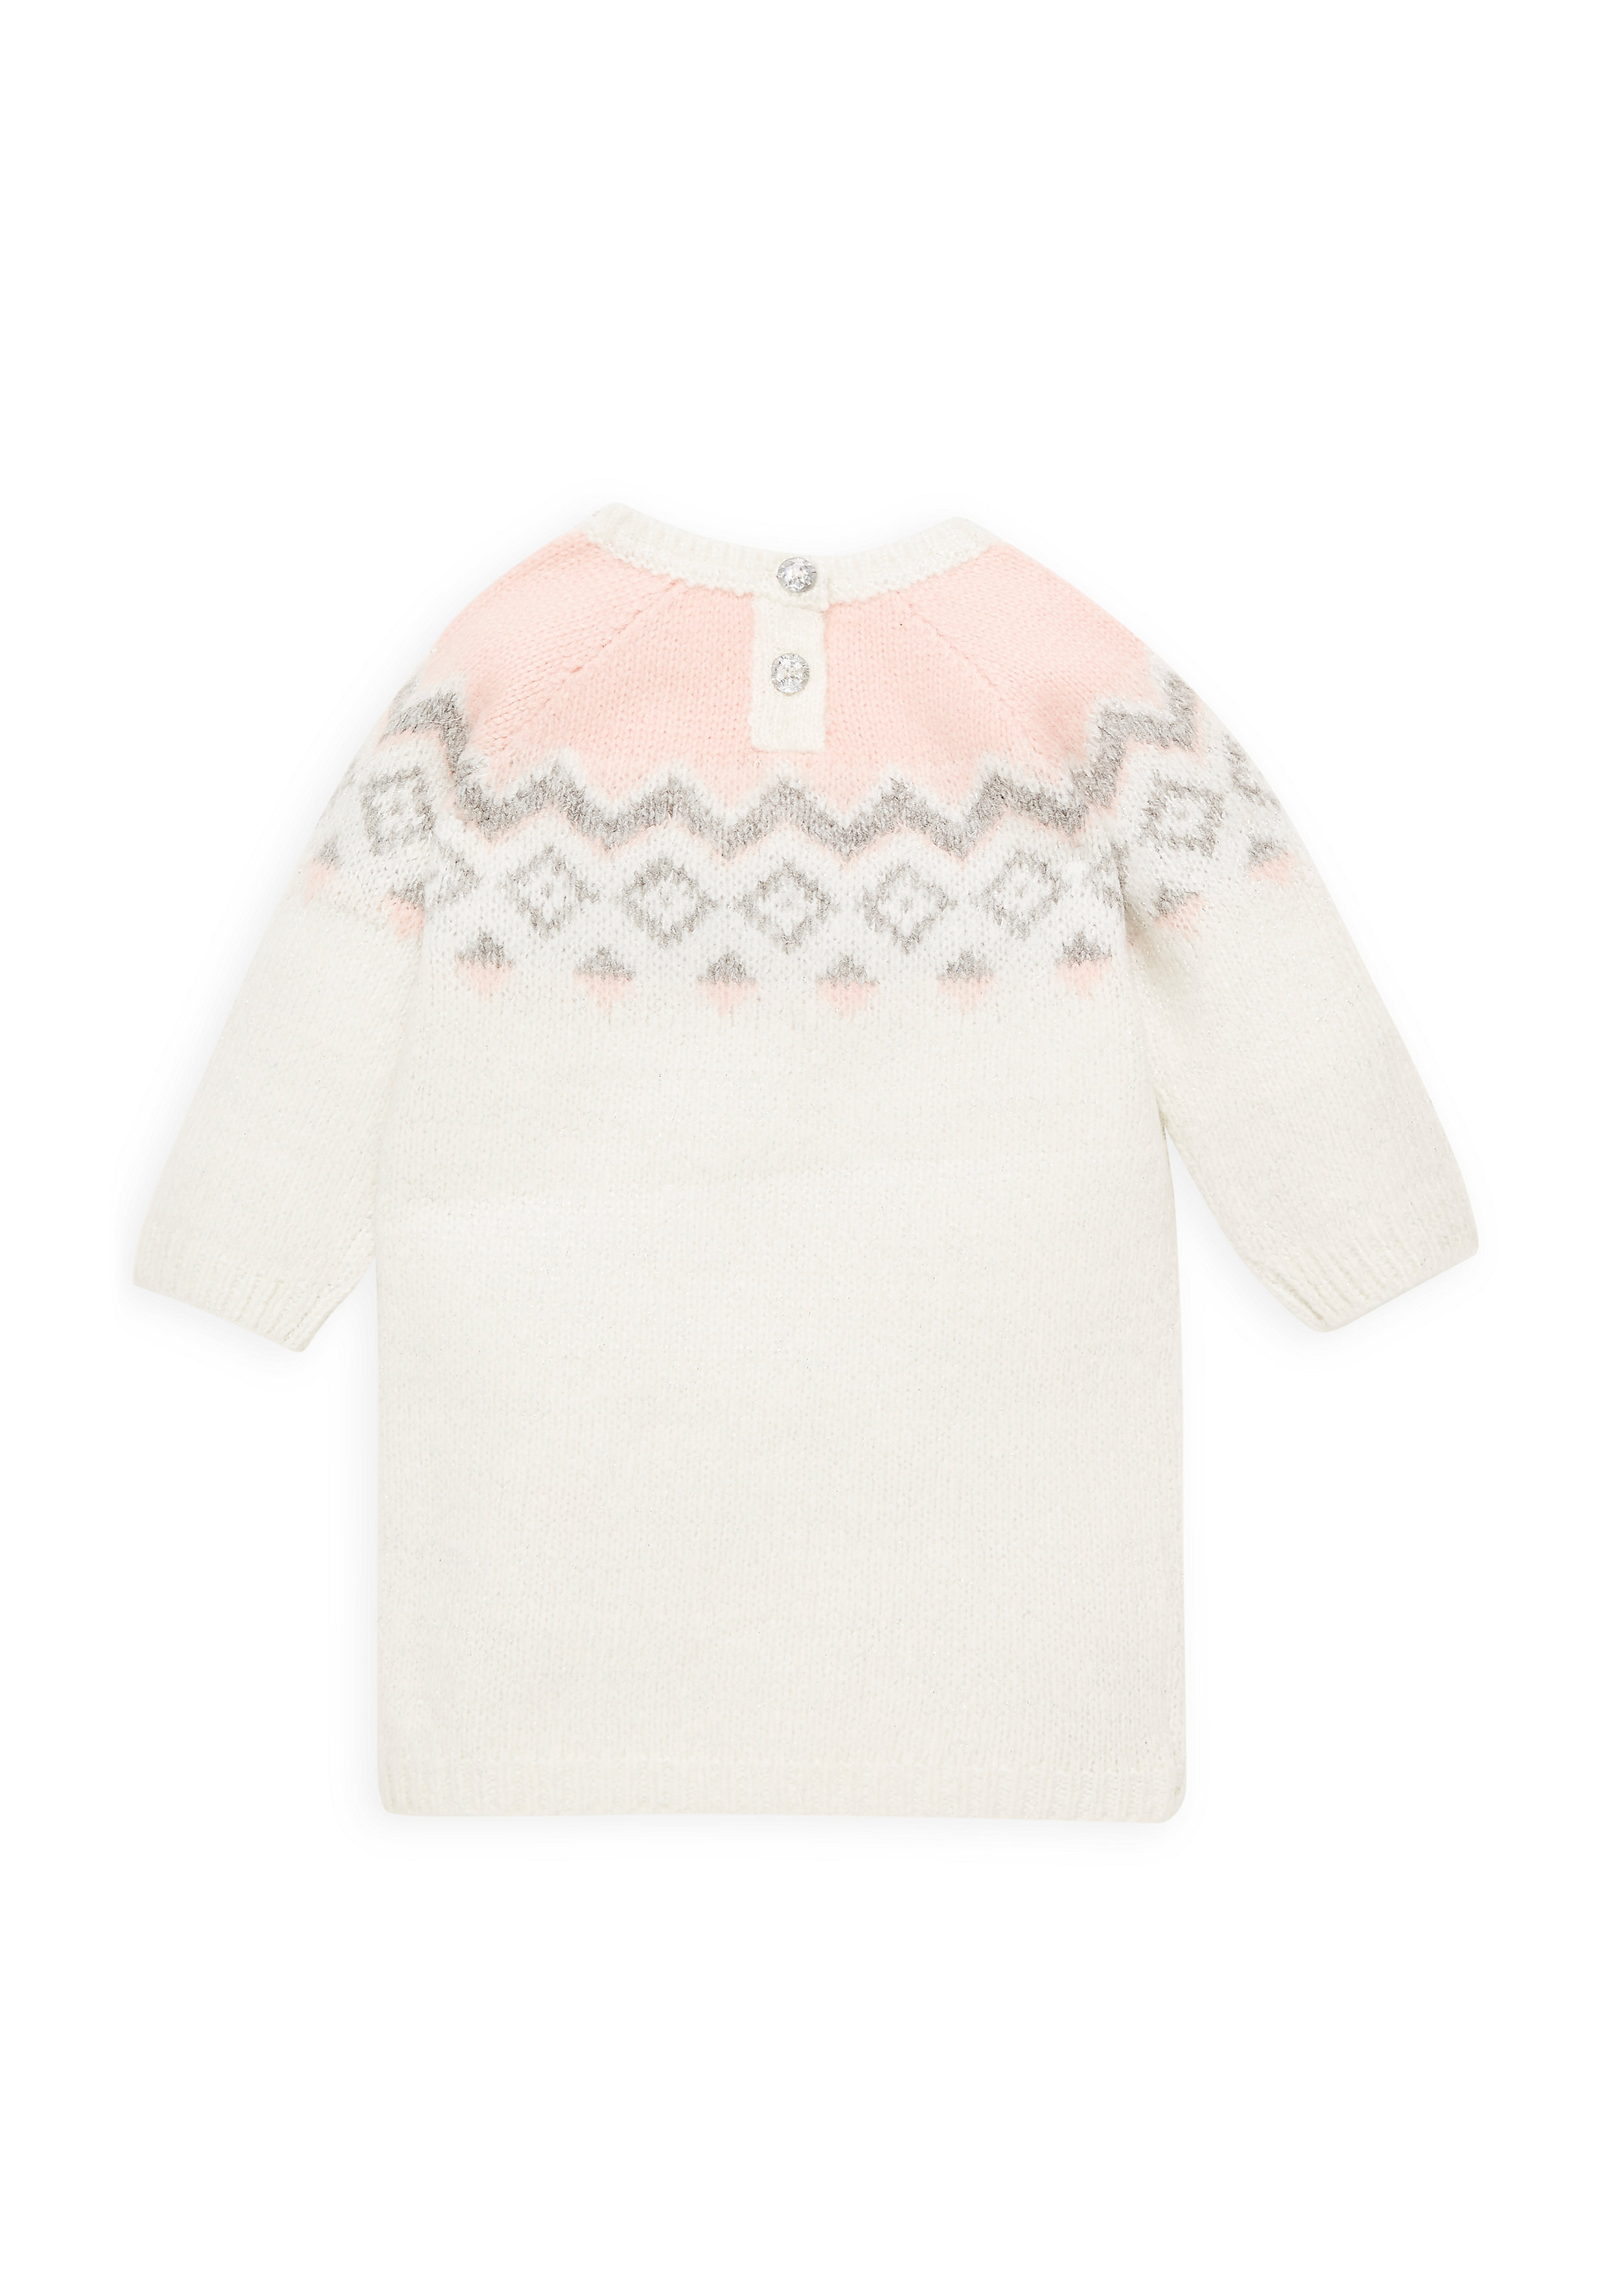 Mothercare   Girls Farisle Dress - Cream